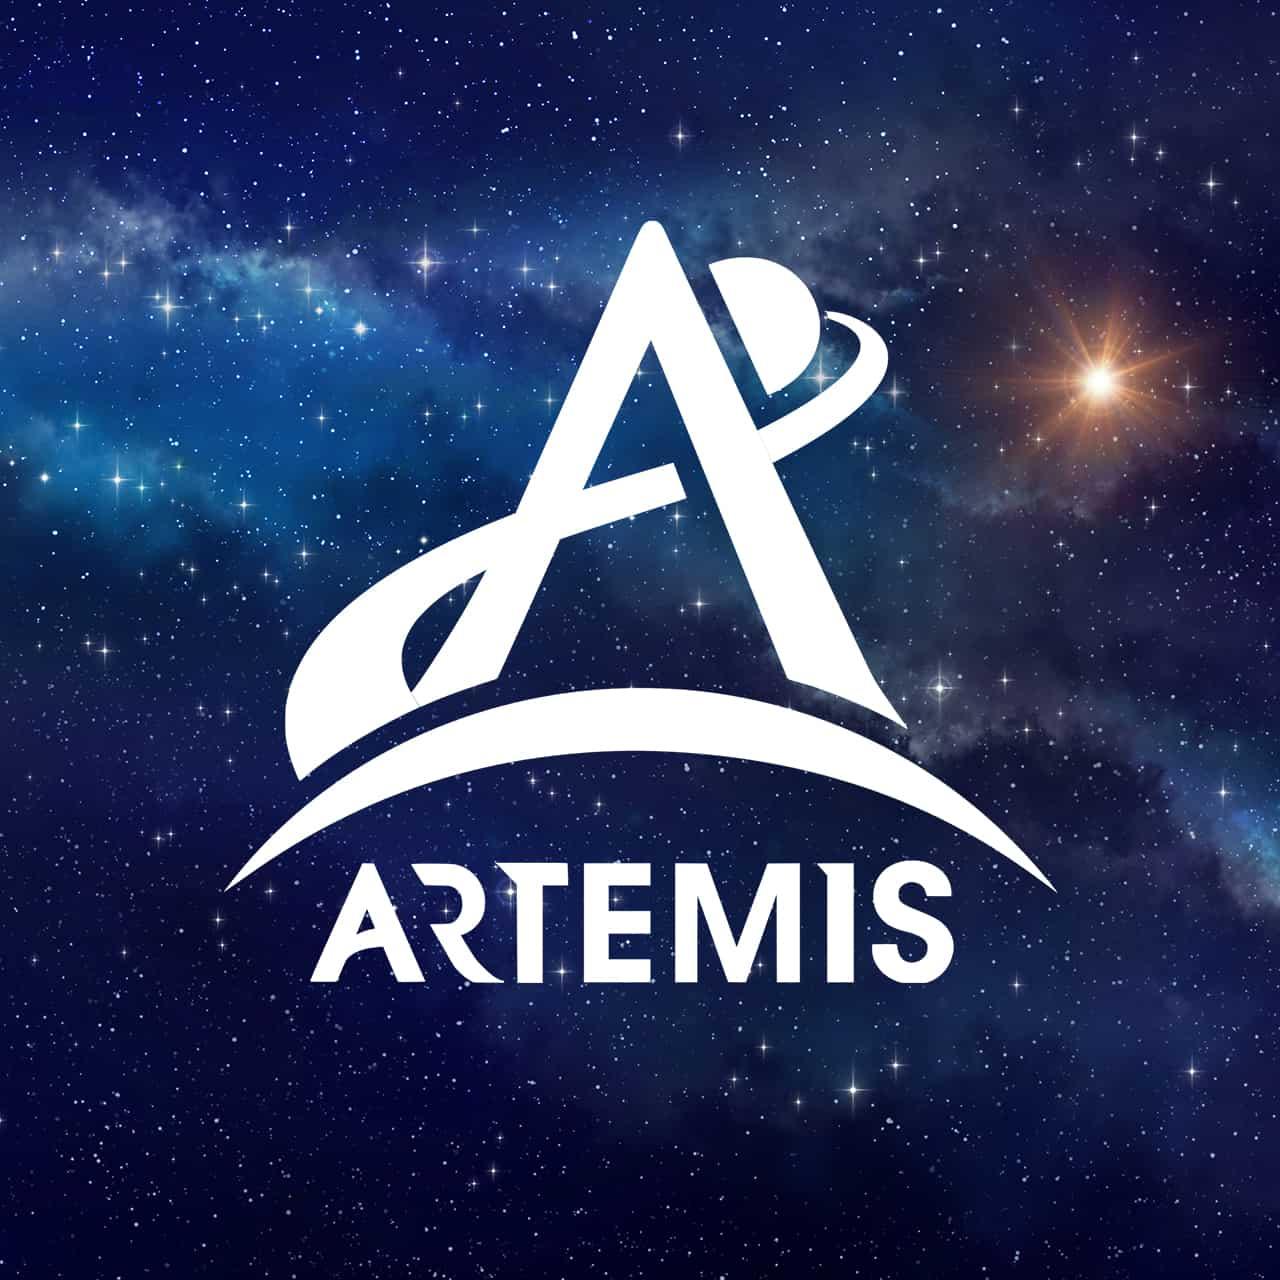 Stars with Artemis NASA Logo